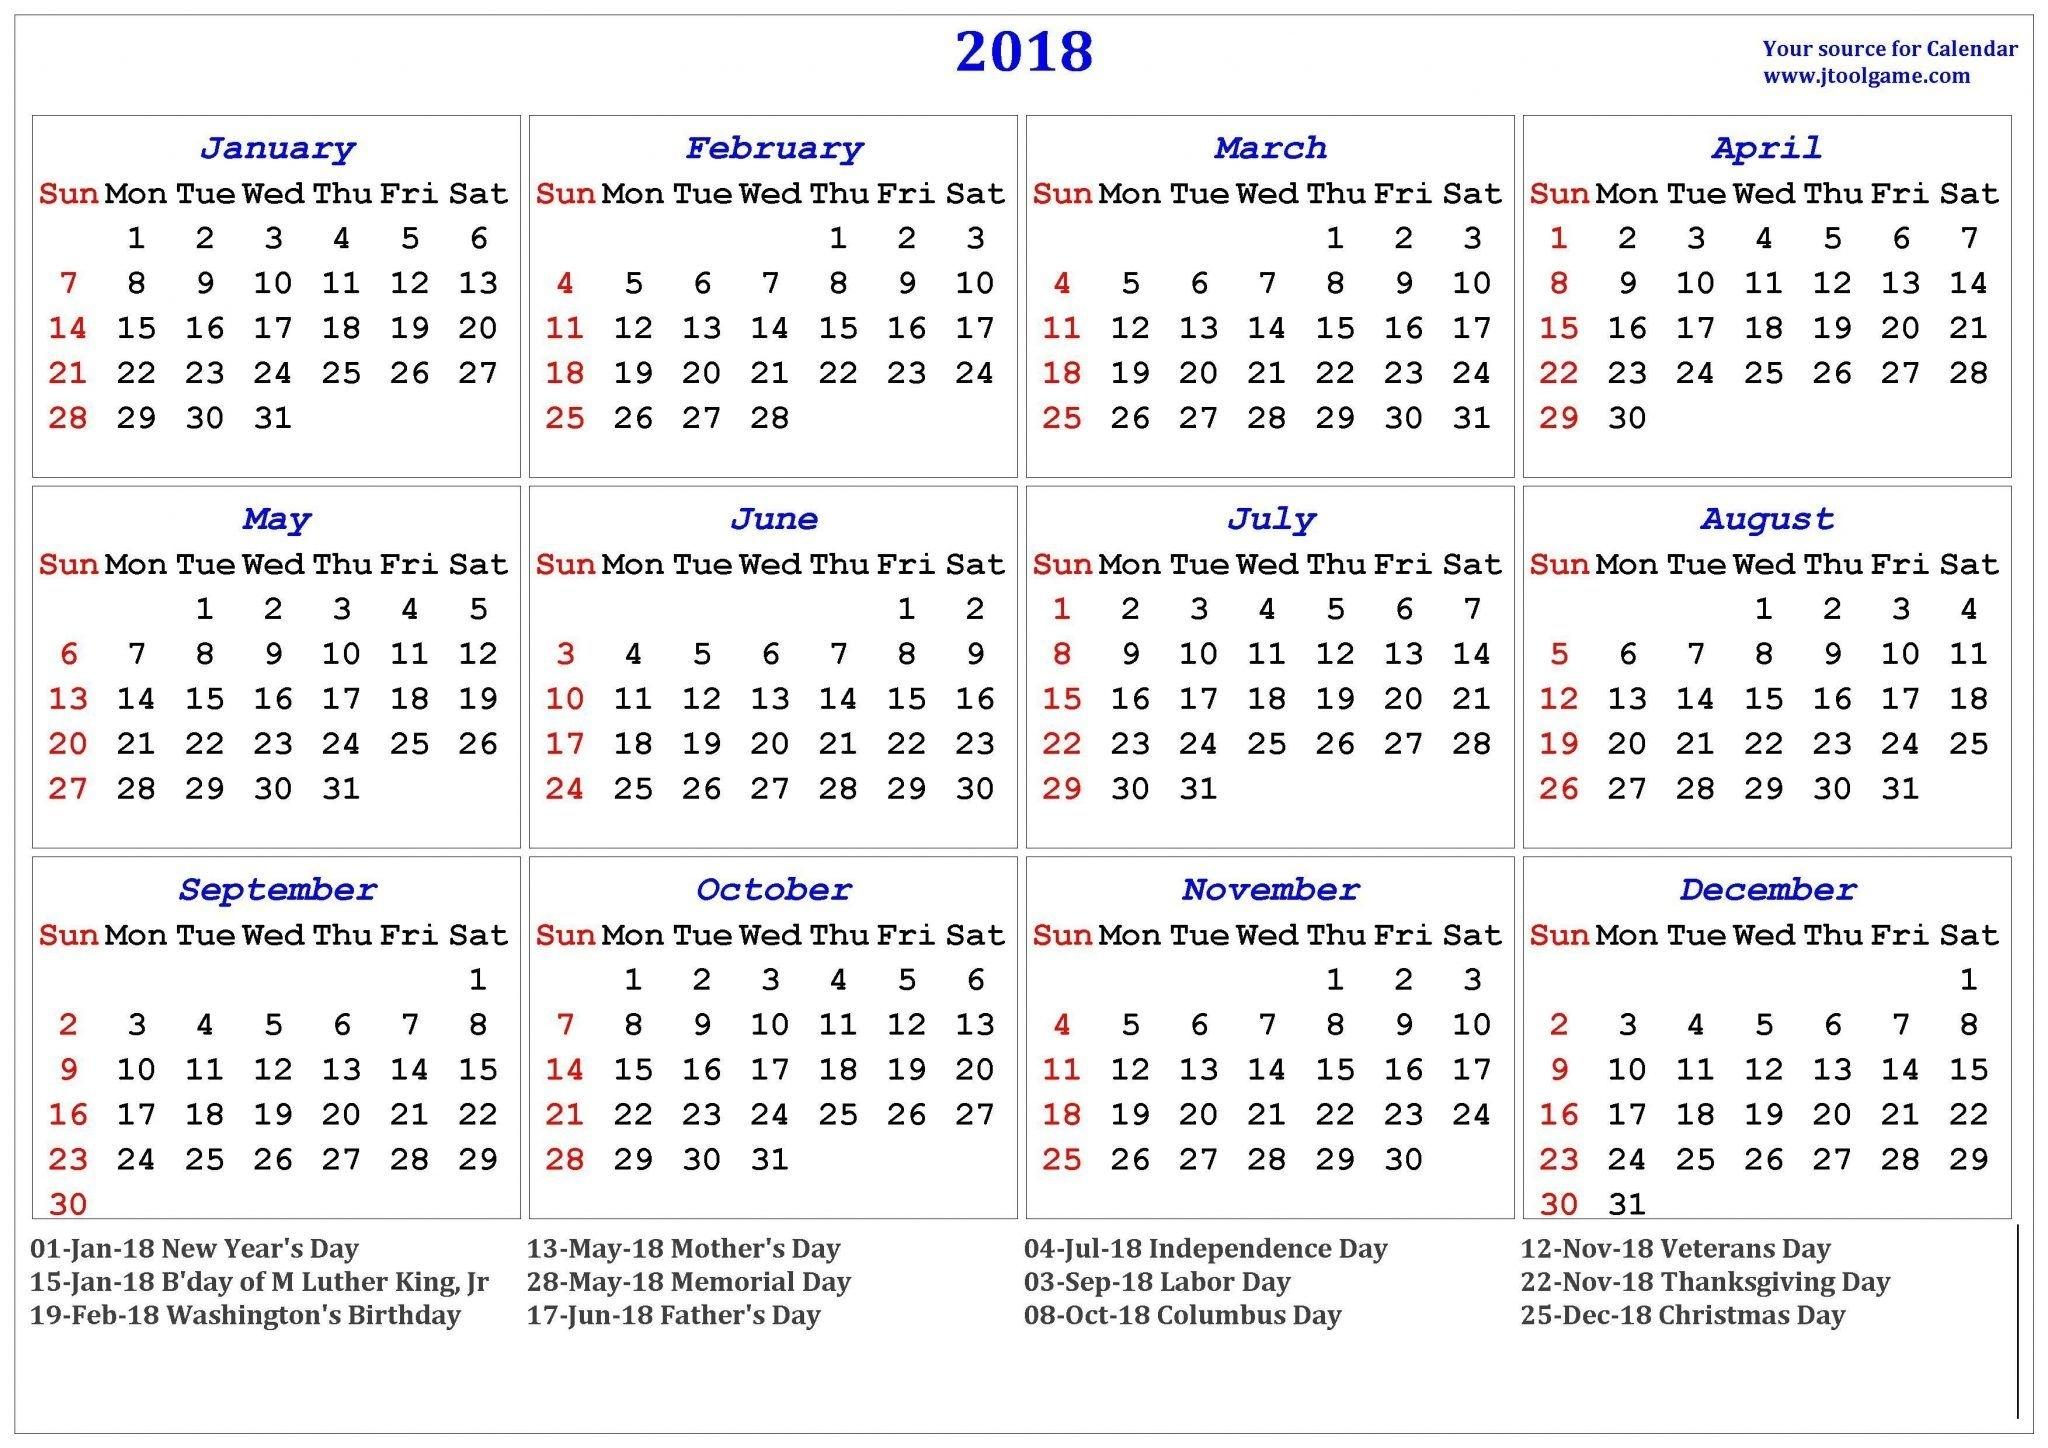 2019 Holidays Usa | Blank November 2018 Calendar | Printable regarding 1 Page Calendar 2019-2020 With Major Holidays